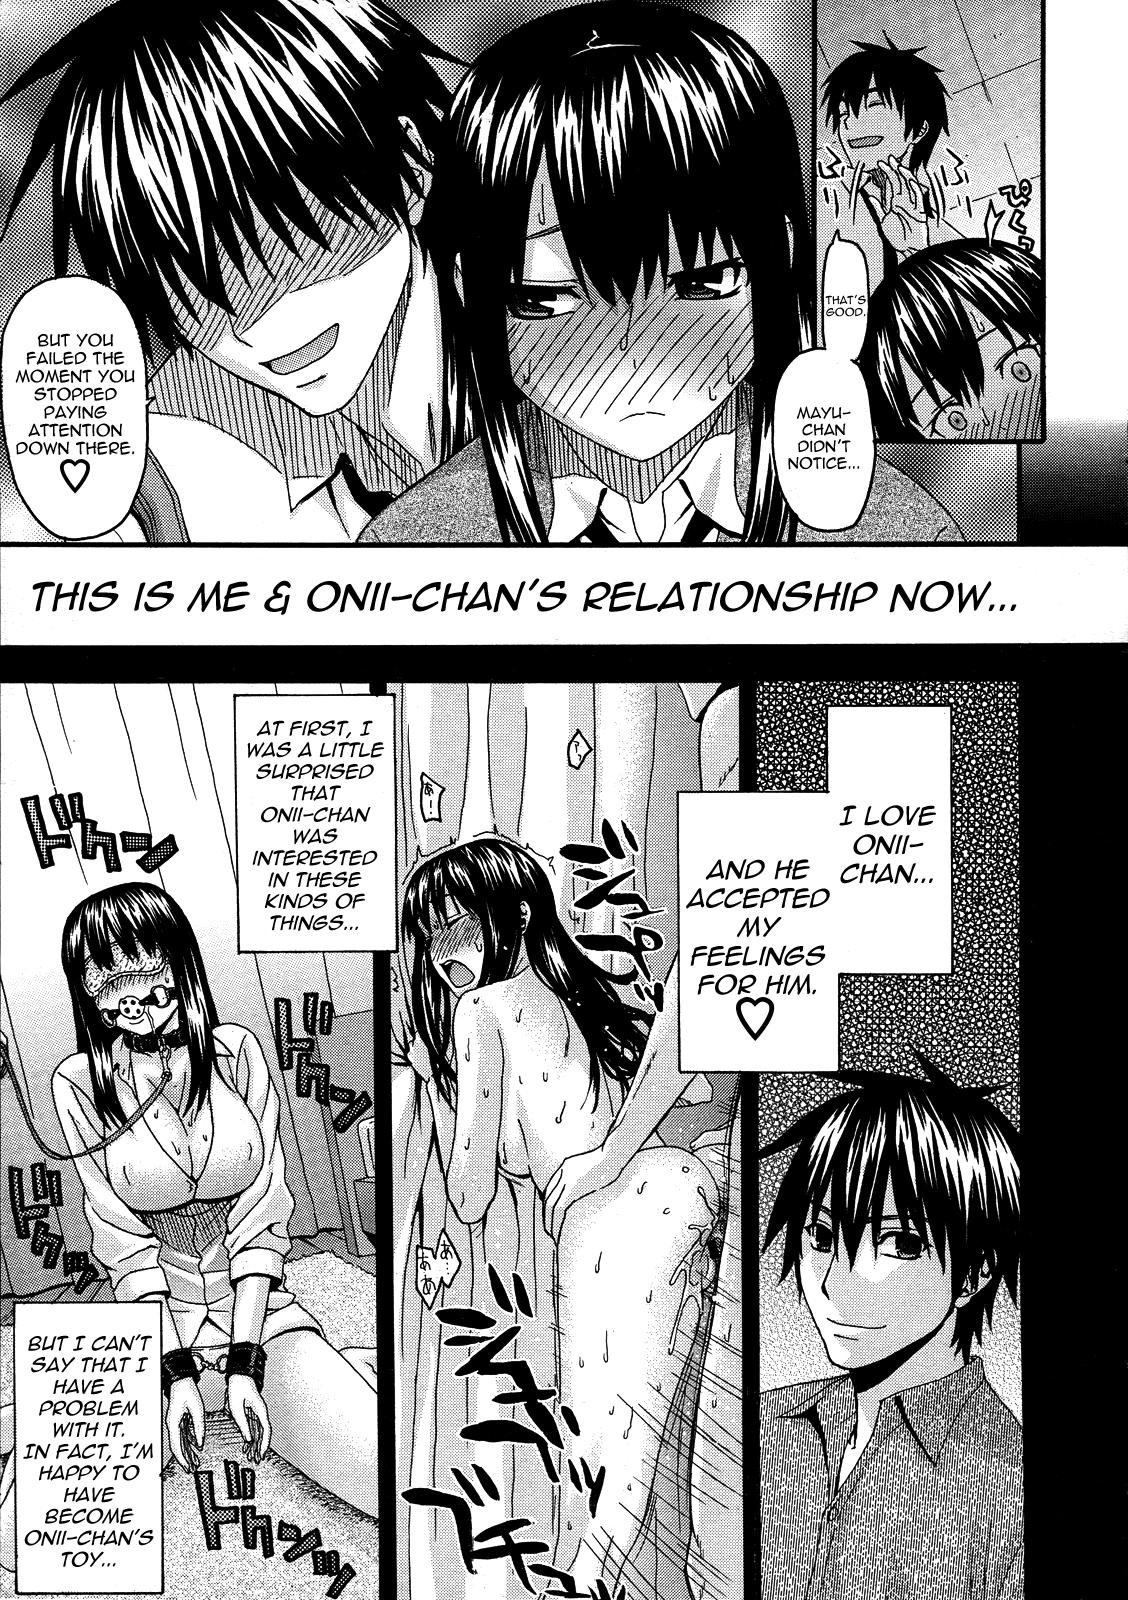 [Saegusa Kohaku] Onii-chan to Watashi | Onii-chan & I (COMIC Megastore 2011-12) [ENG] [Yoroshii] 6